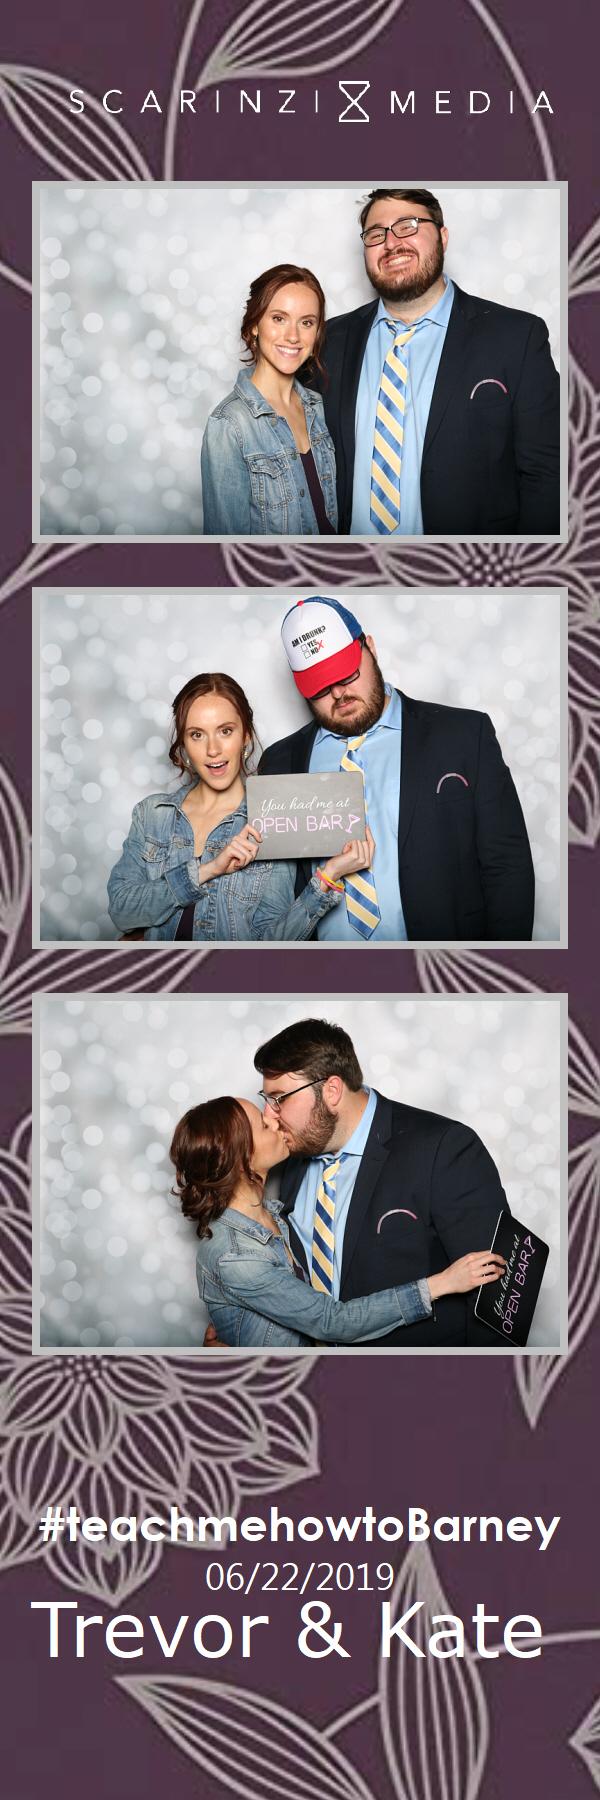 2019.06.22 - Barney Wedding PHOTOBOOTH58.jpg